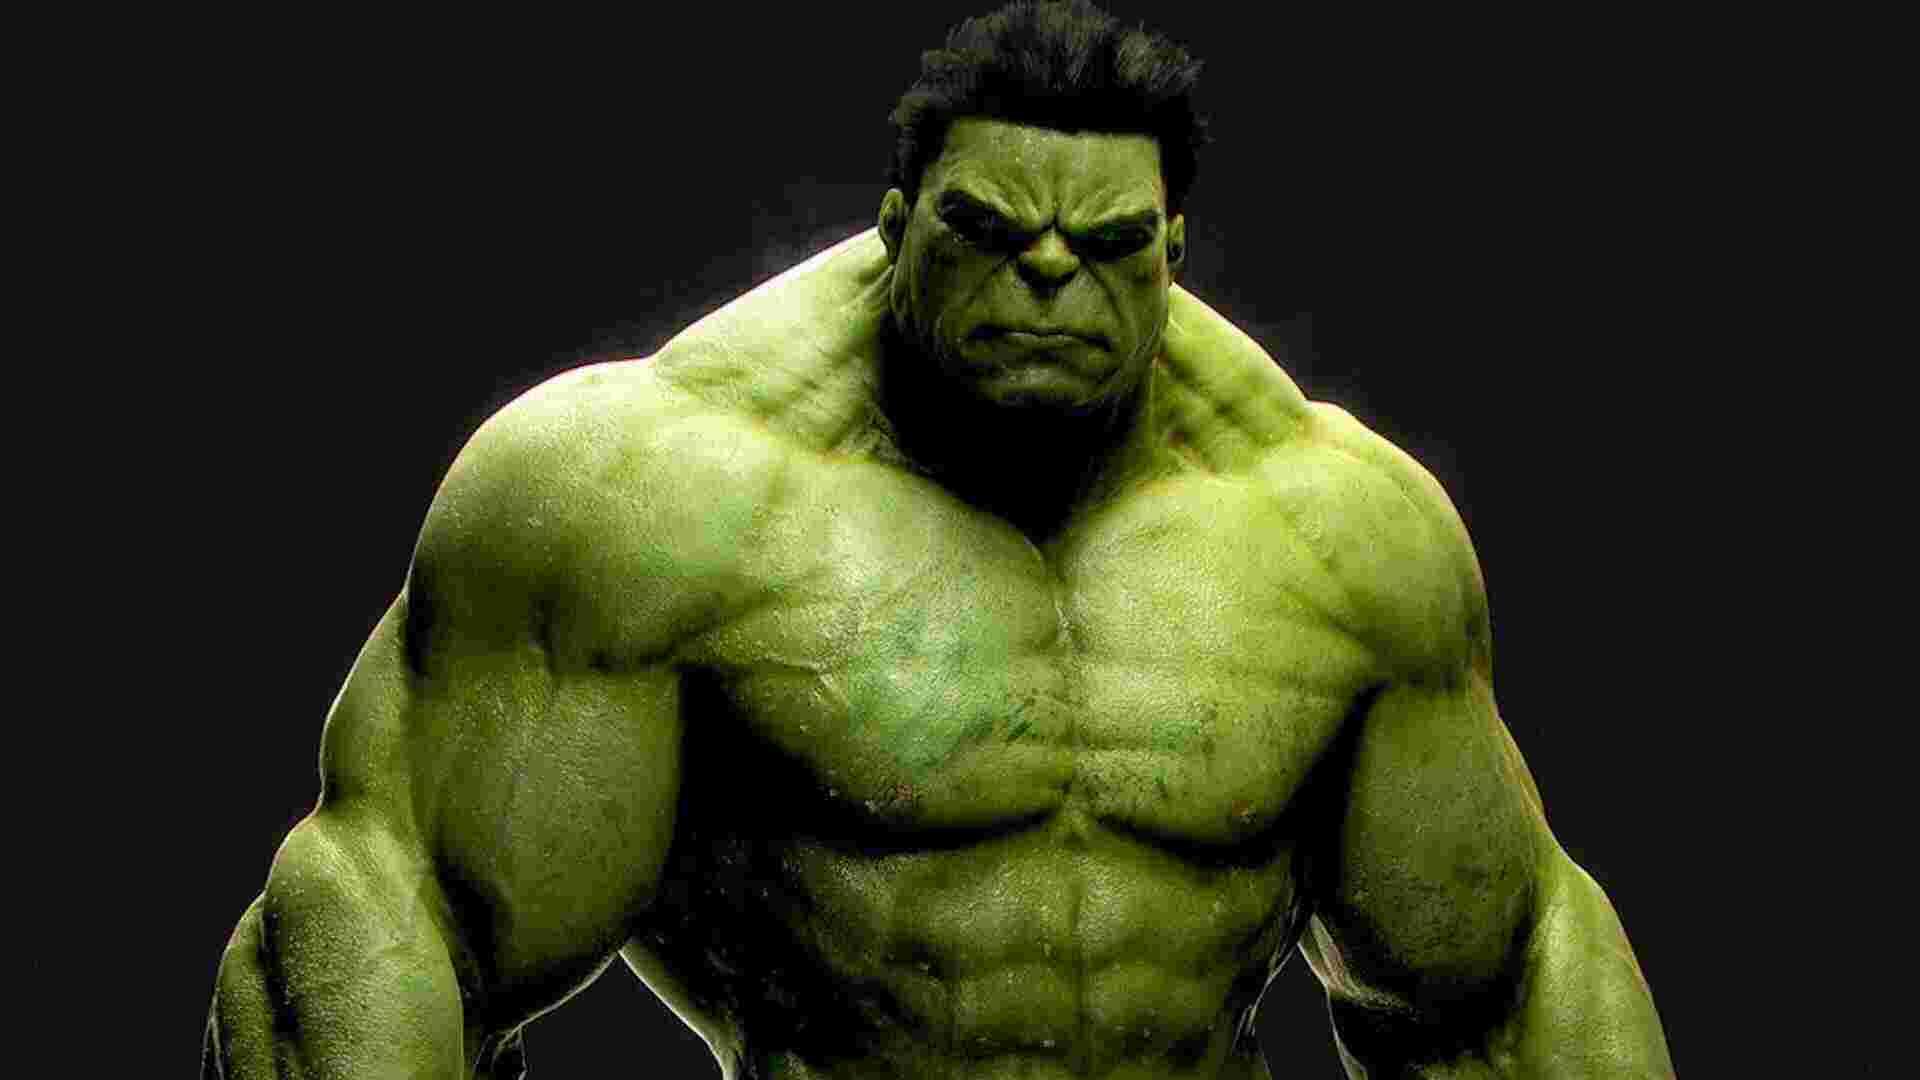 hero hulk hero hd wallpaper hulk images high def huluk superhero hulk